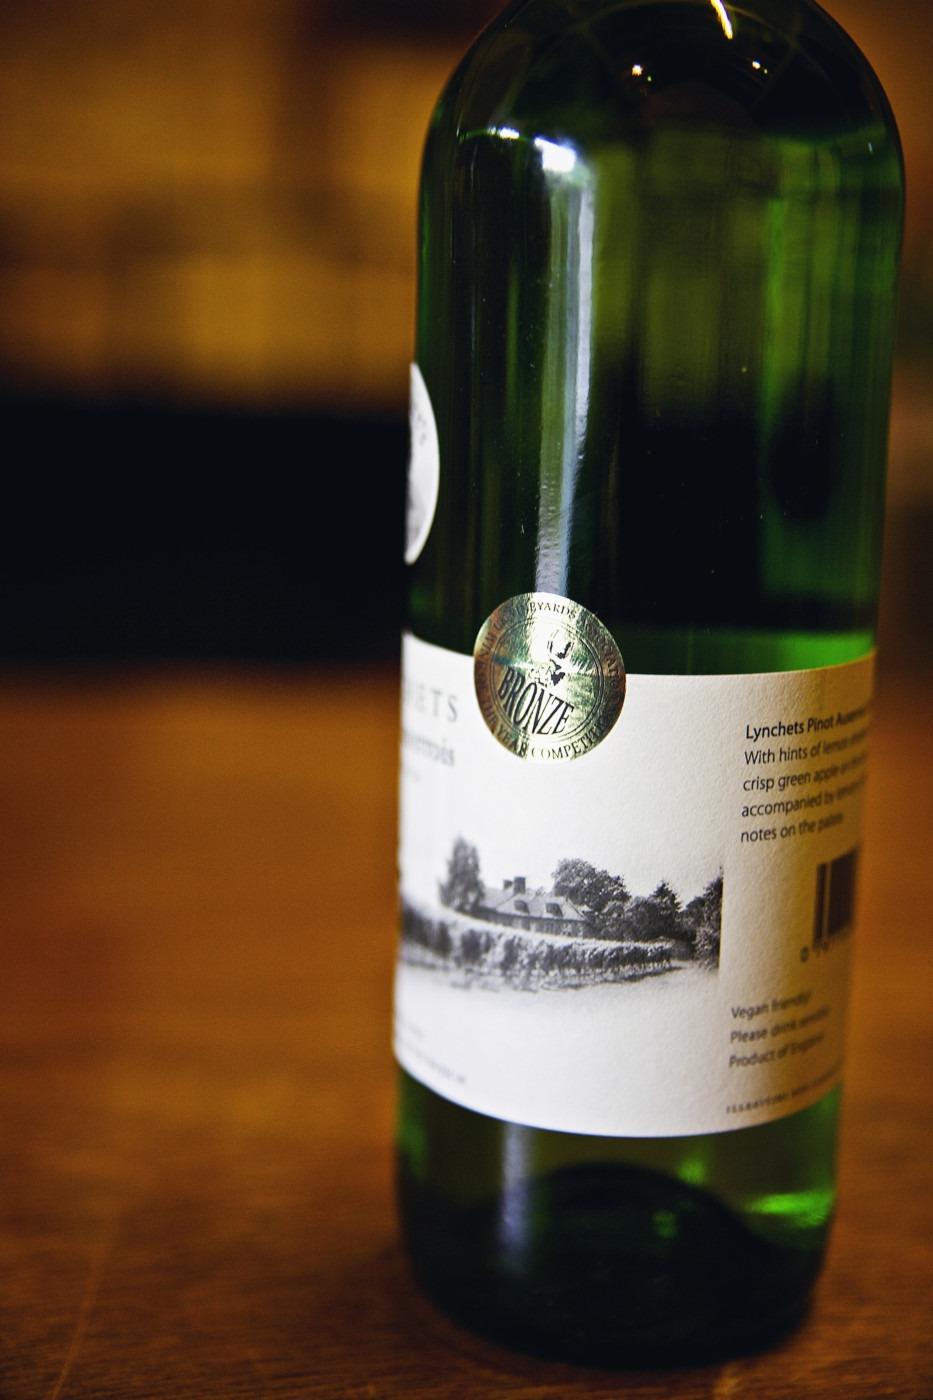 Lynchets Pinot Auxerrois